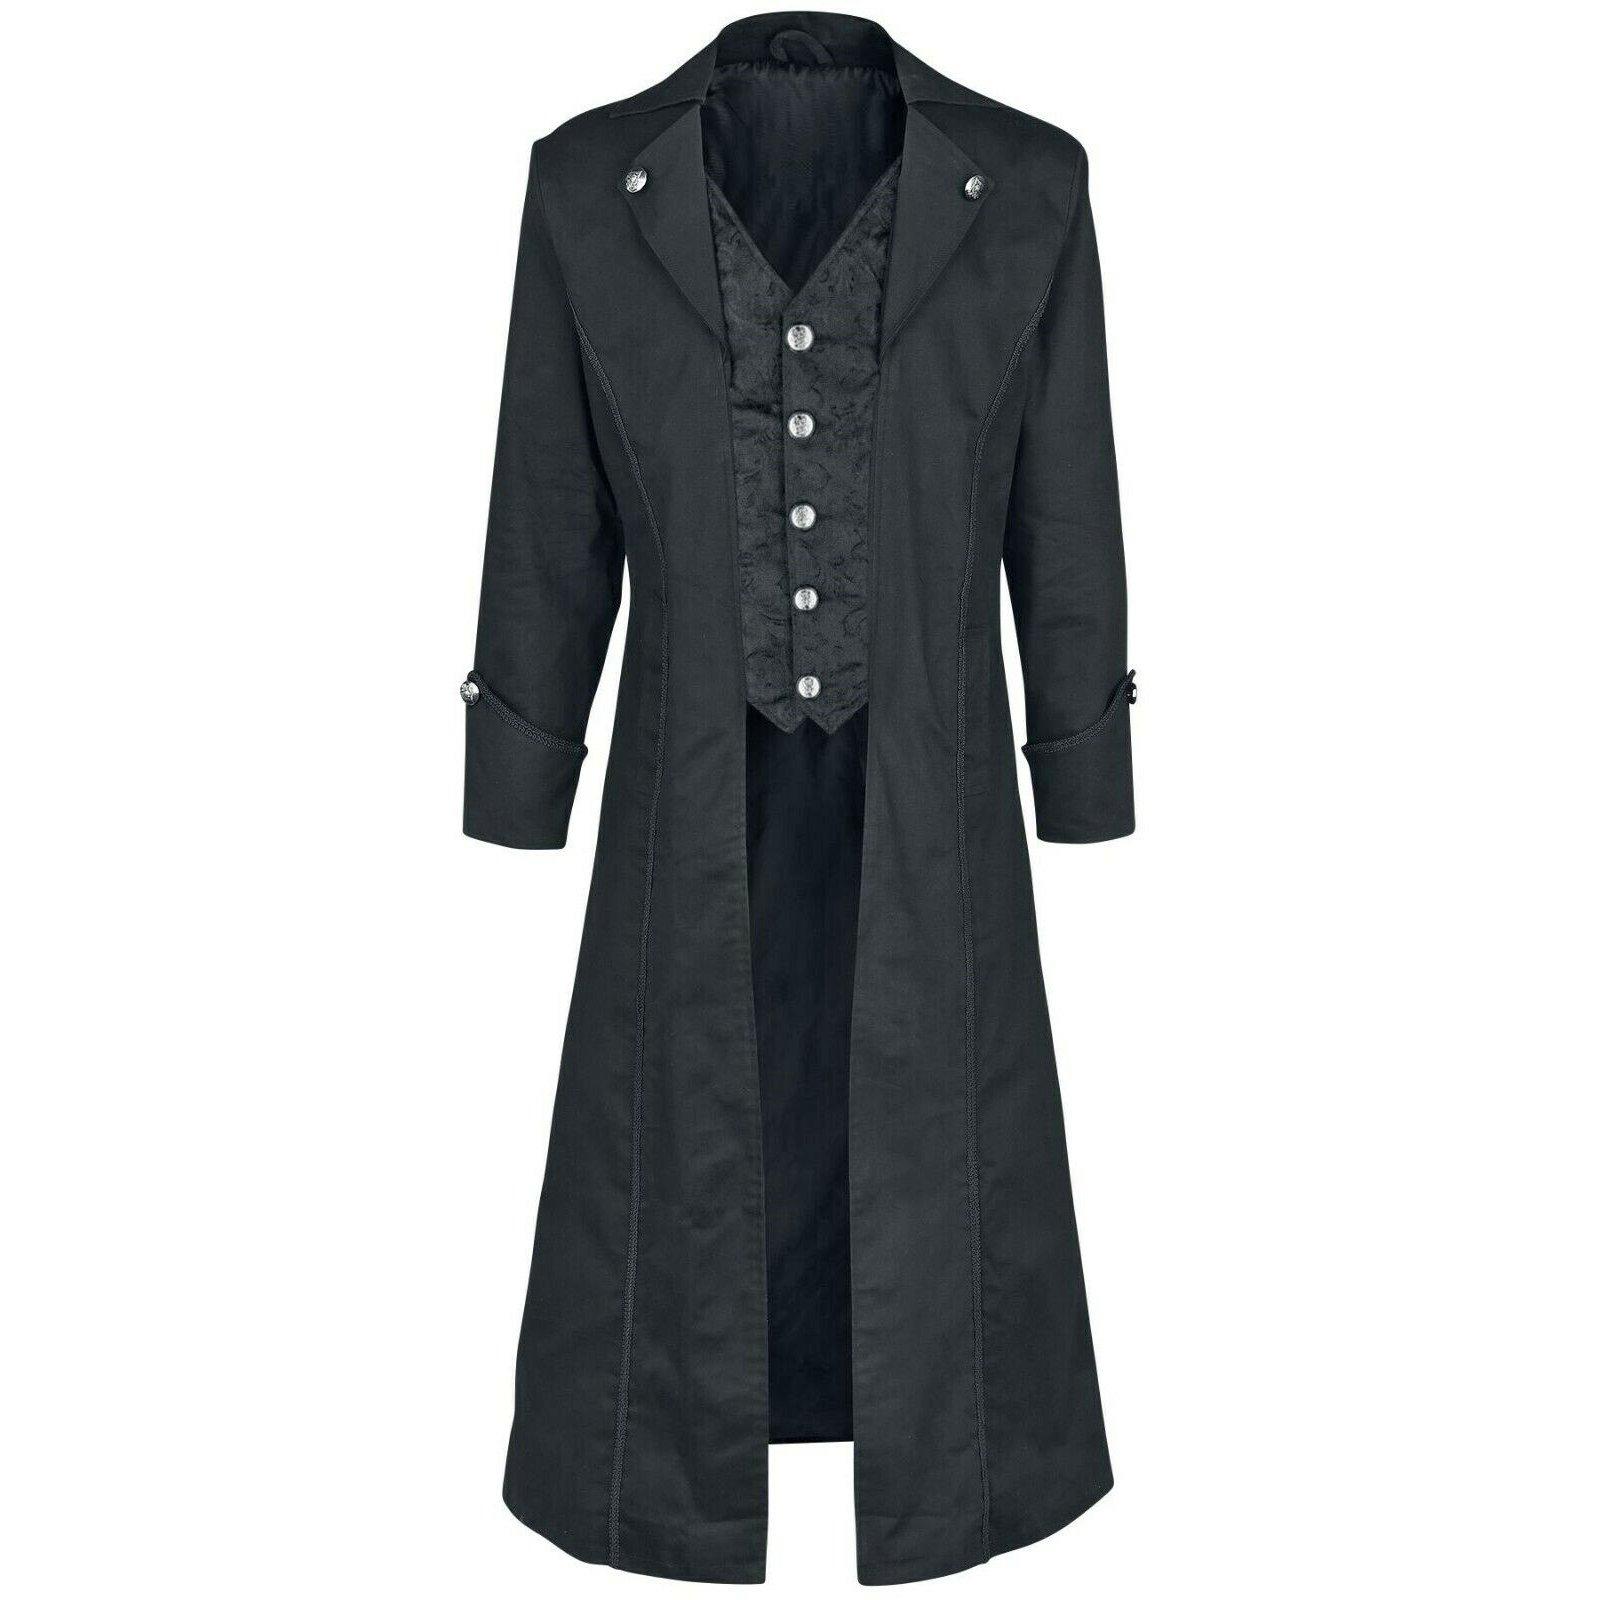 DARKROCK Gothic Steampunk Army Black Jacket Men's Punk Highwayman Regency Long Coat (4)